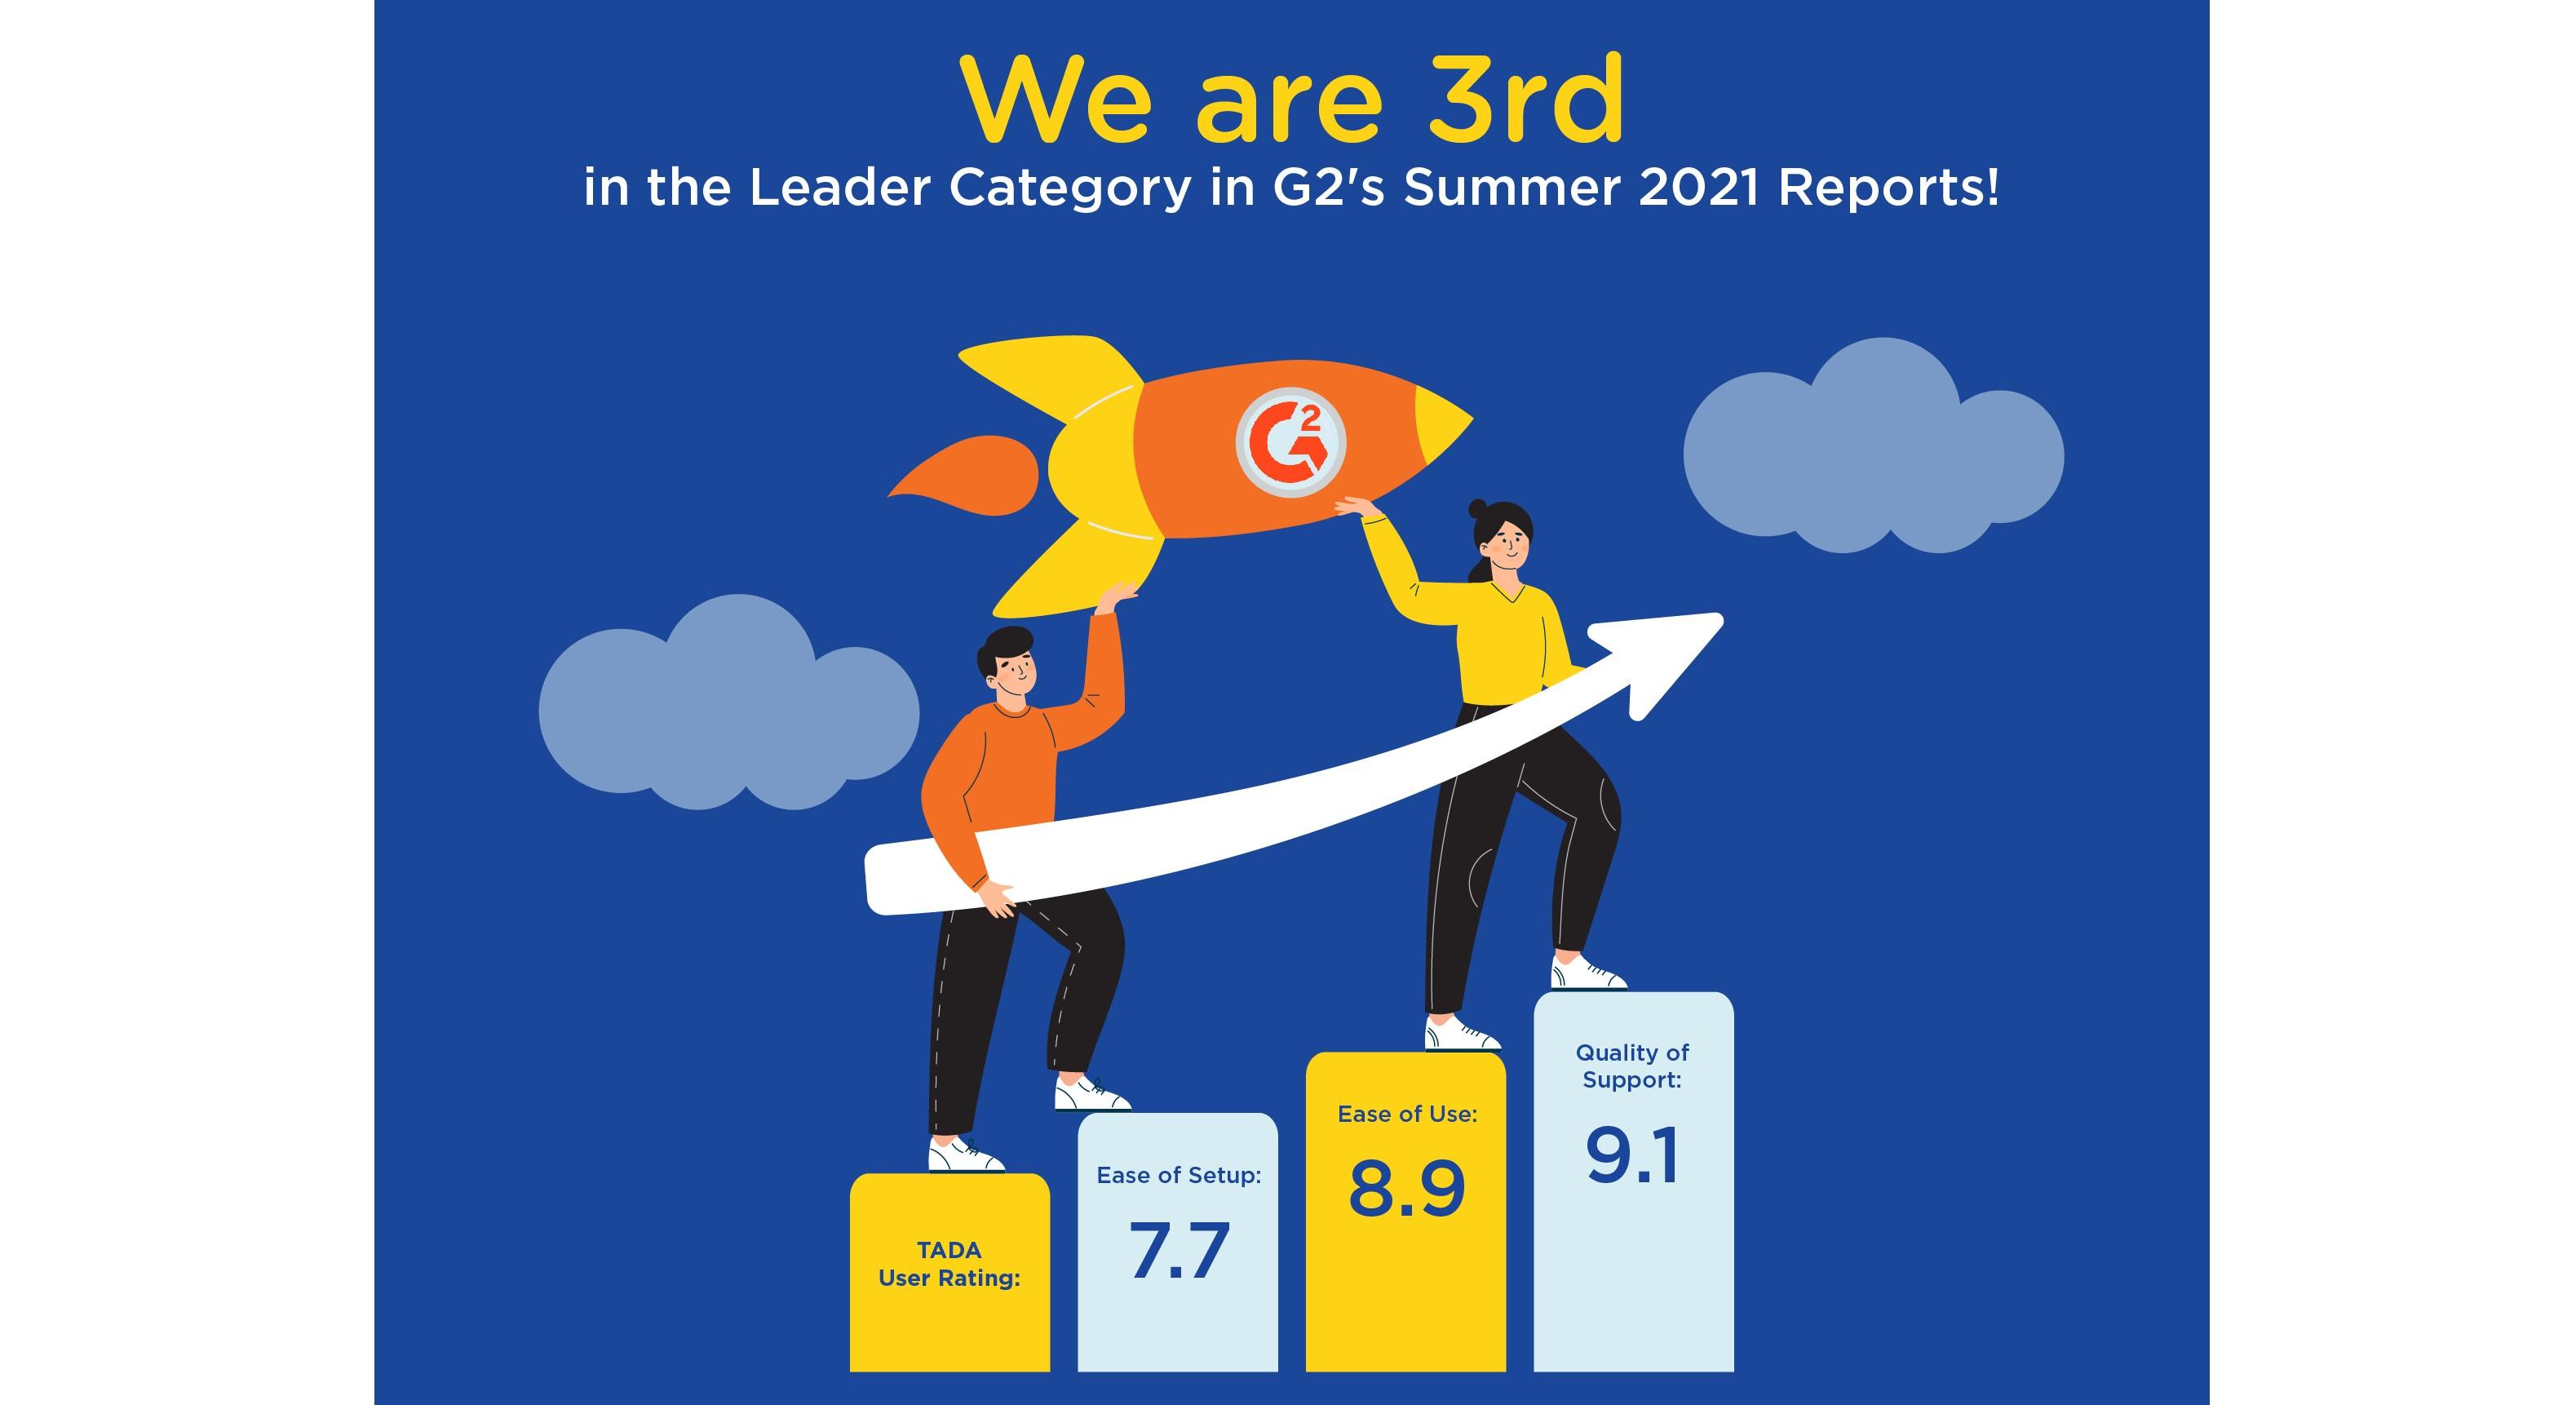 TADA G2 Report Summary 2021